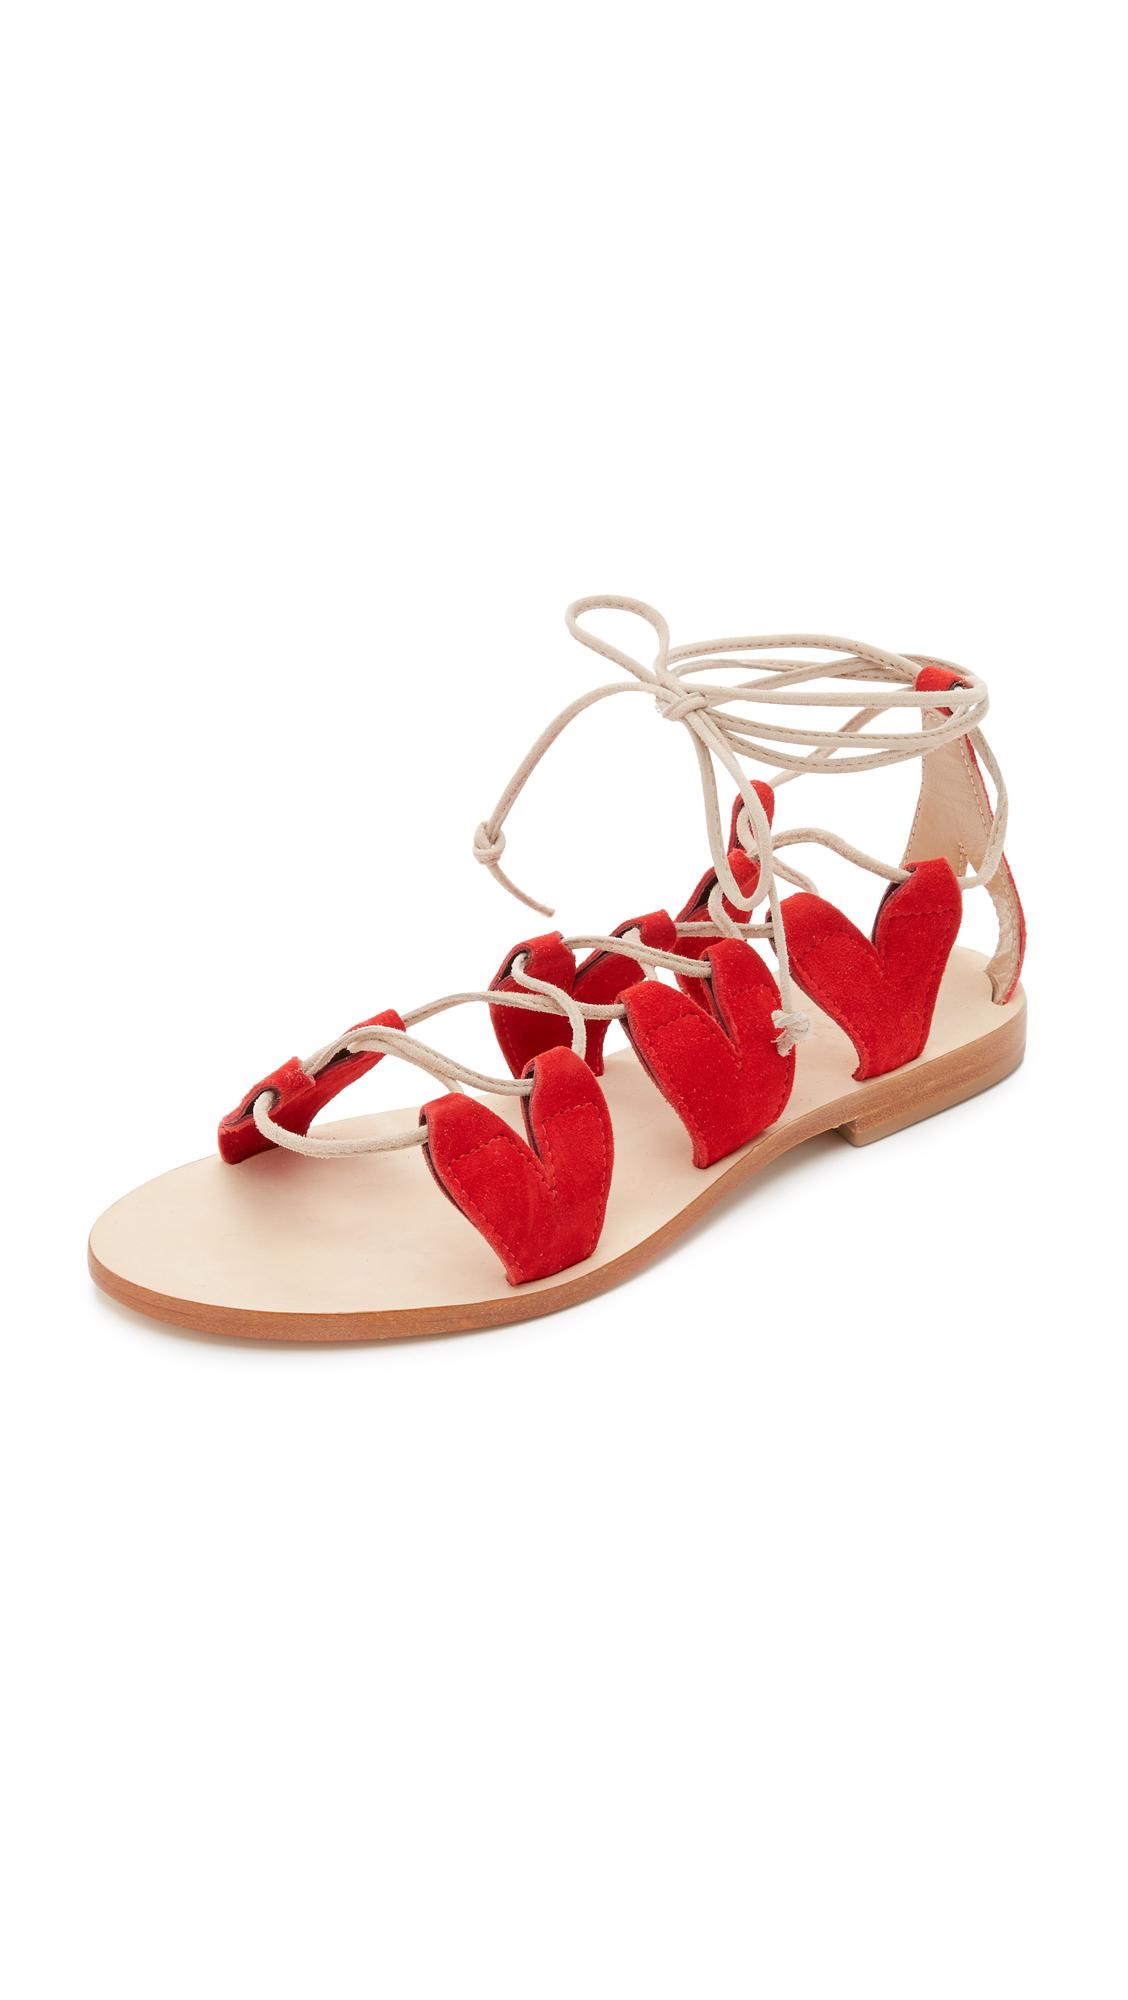 d86316e4ca14 Cornetti Innamorati Gladiator Sandals in Red - Lyst